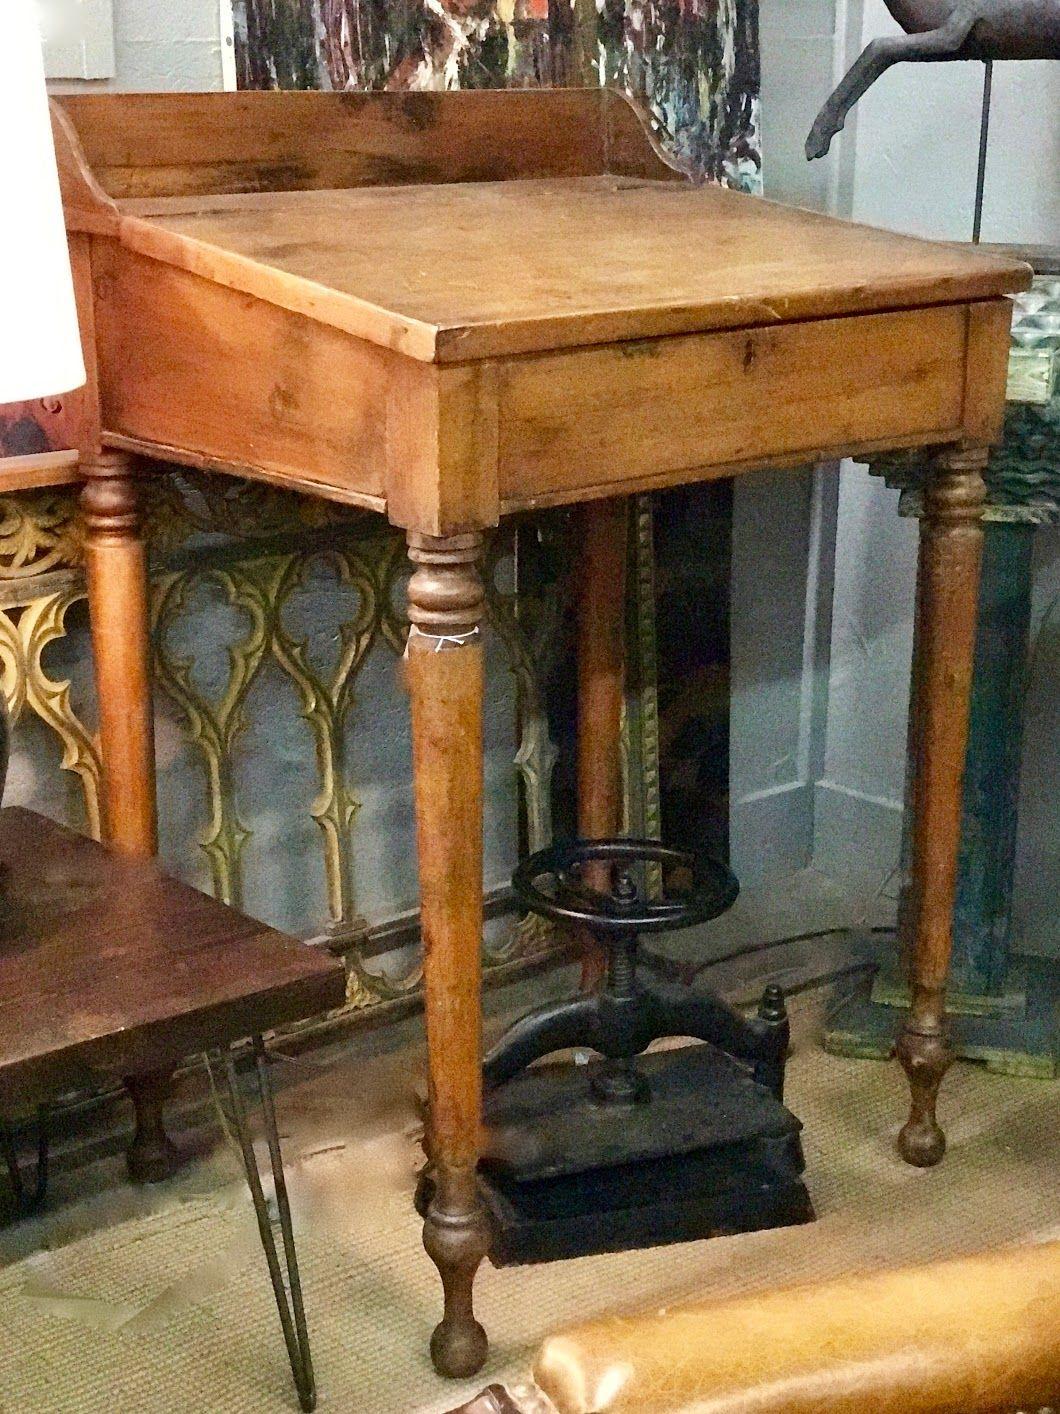 Antique Tall Pine Teachers Desk or Host Podium Stand On Sale 31.5